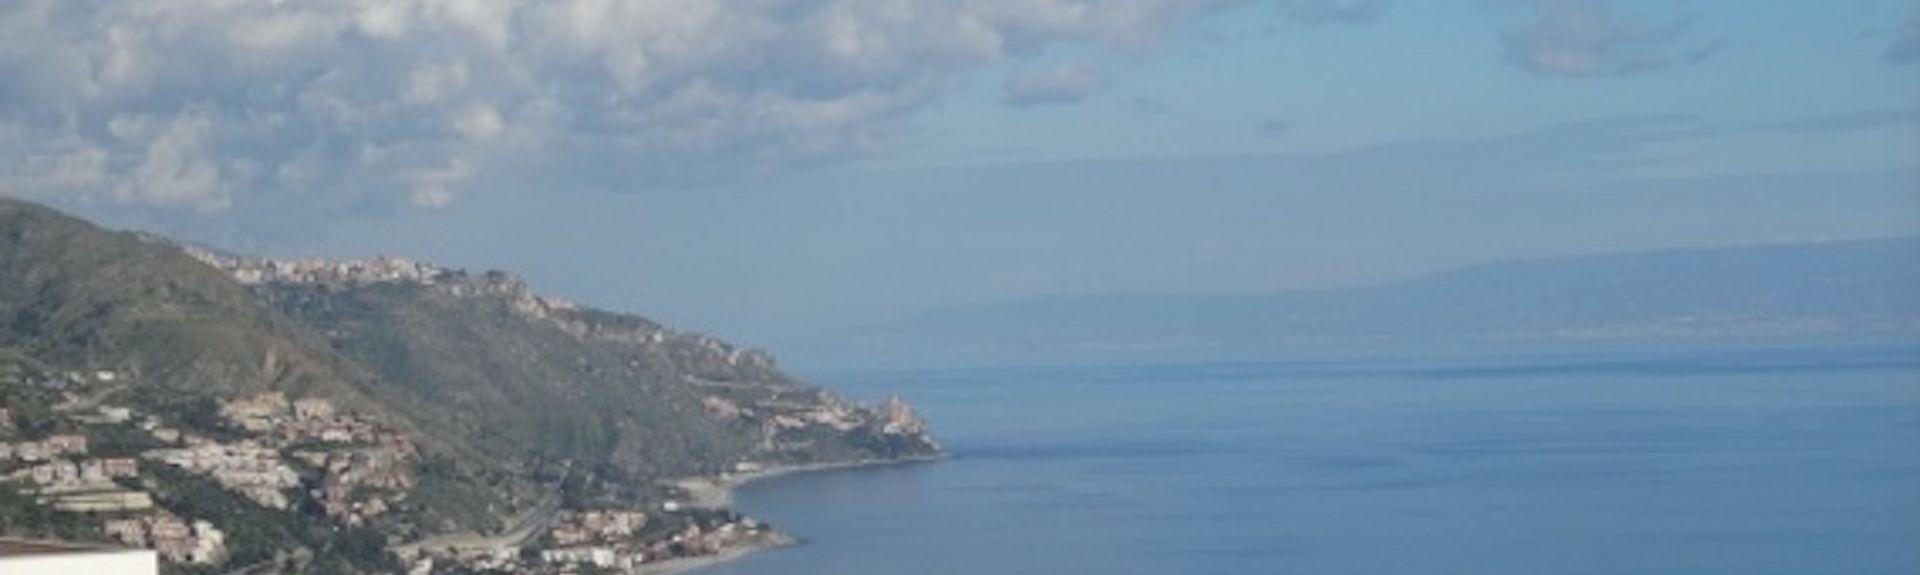 Isola Bella (eiland), Taormina, Sicilië, Italië